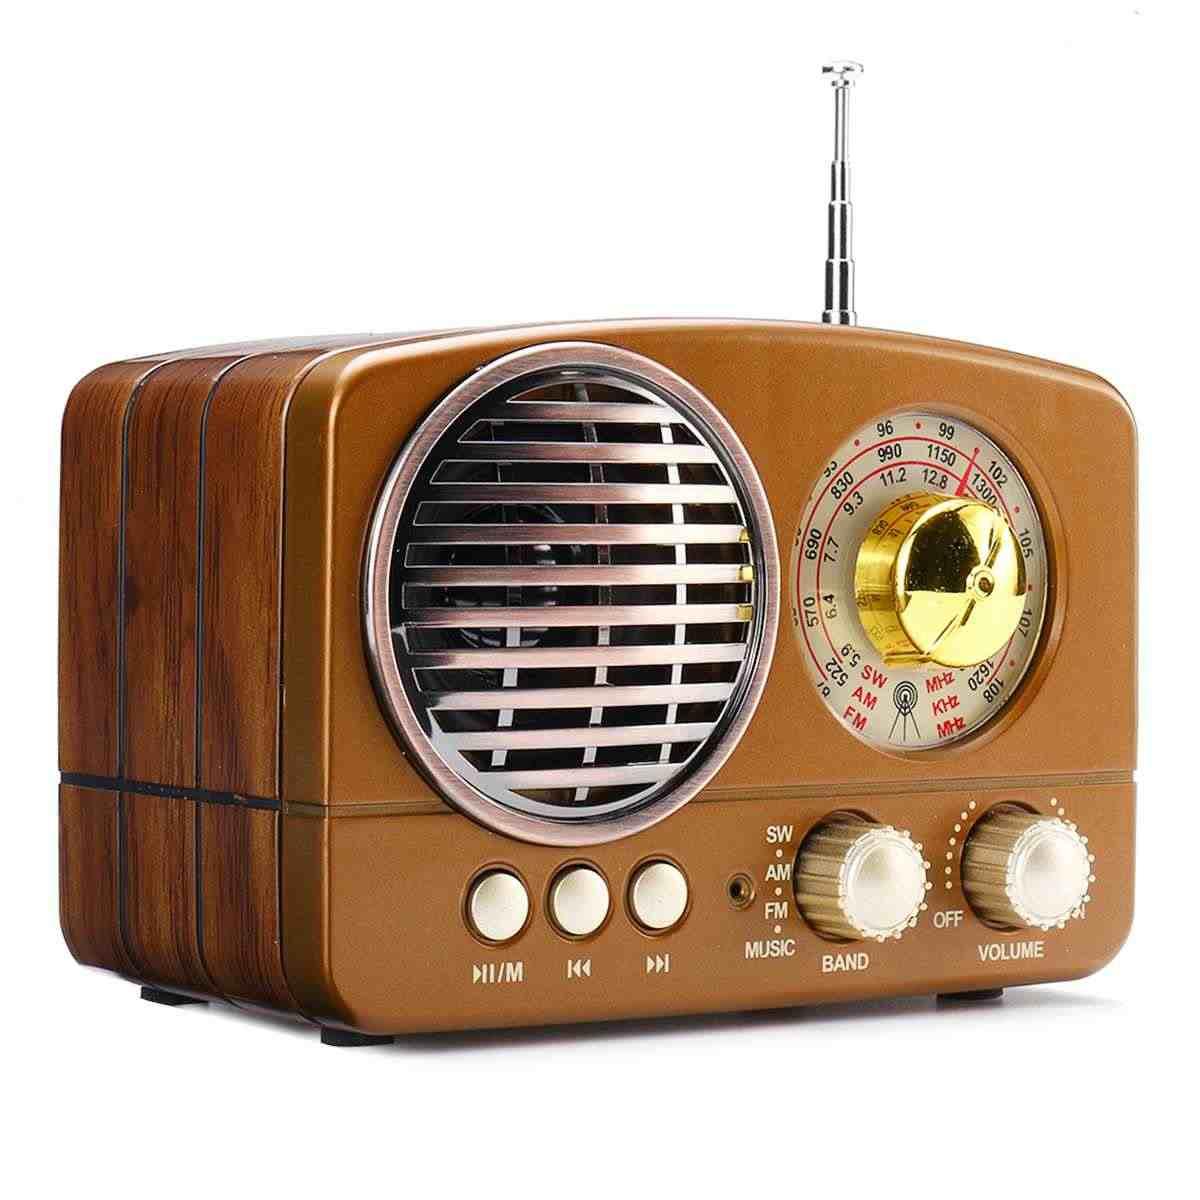 Radio portátil Retro inalámbrico bluetooth HIFI altavoz estéreo auriculares FM AM SW USB AUX TF tarjeta MP3 receptor Multimedia clásico